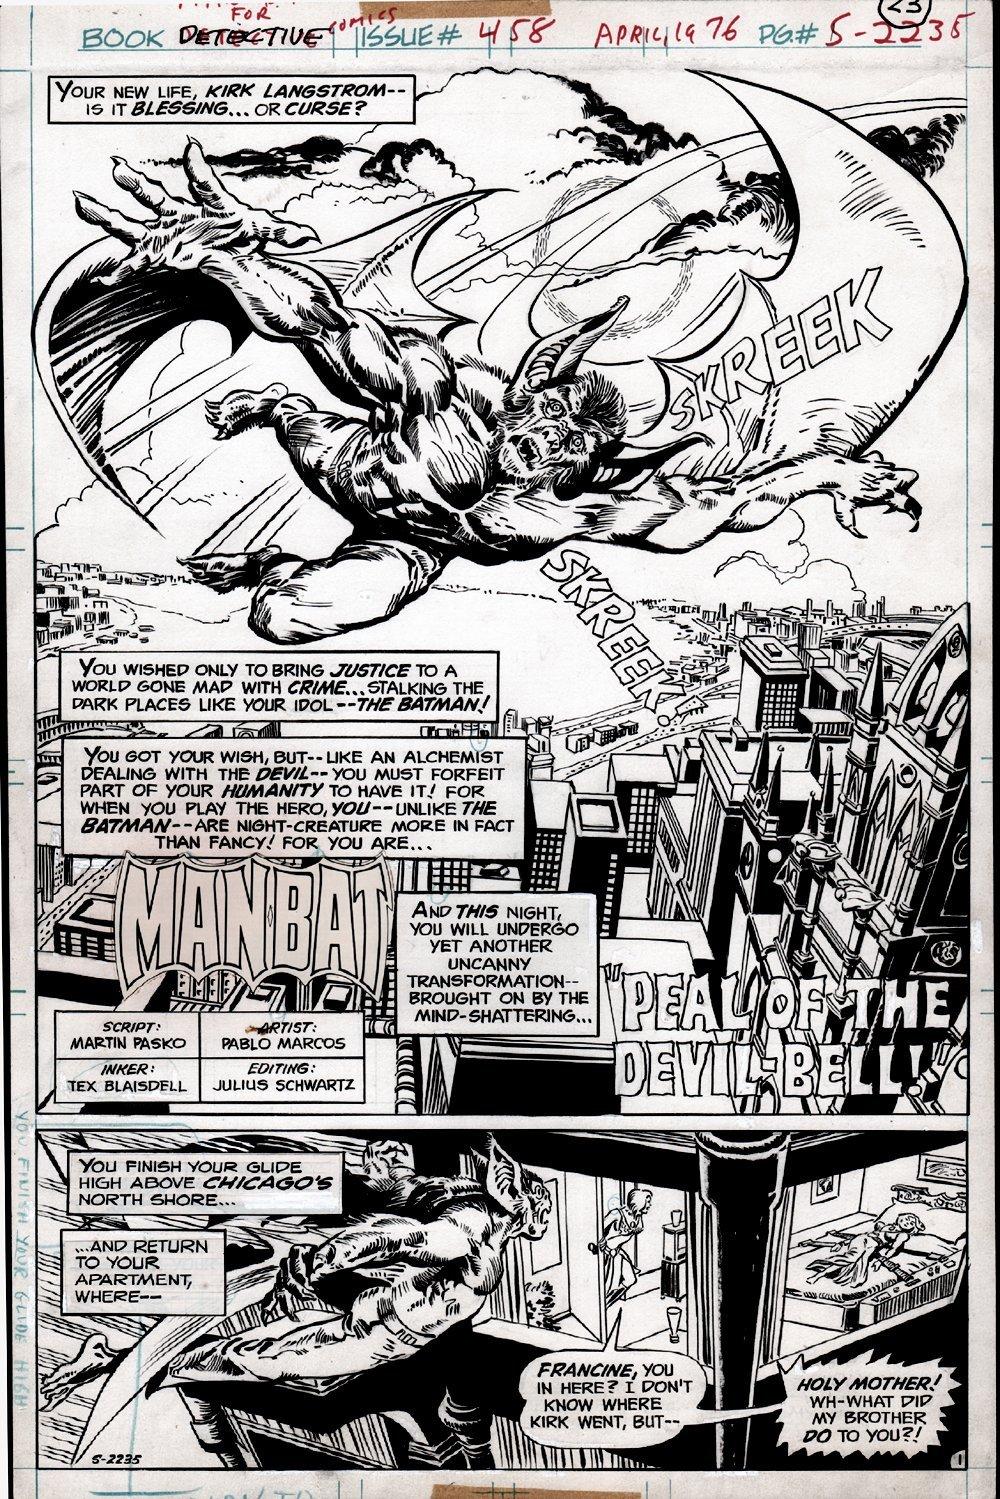 Detective Comics #458 p 1 SPLASH (AWESOME MAN-BAT!) 1975